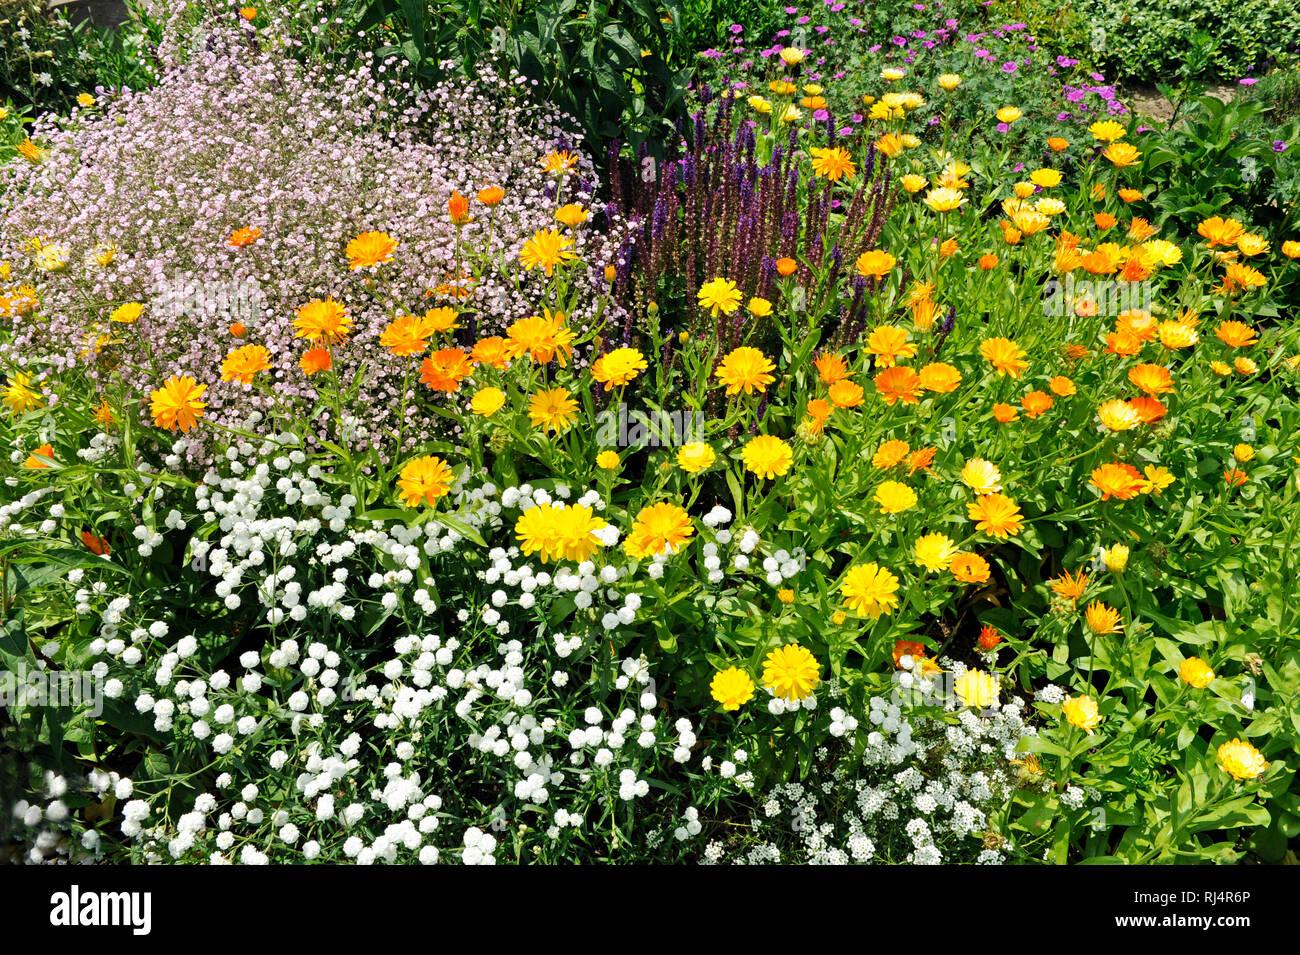 Bunte Sommerblumen diverser Sorten bl?hen im Bauerngarten, - Stock Image